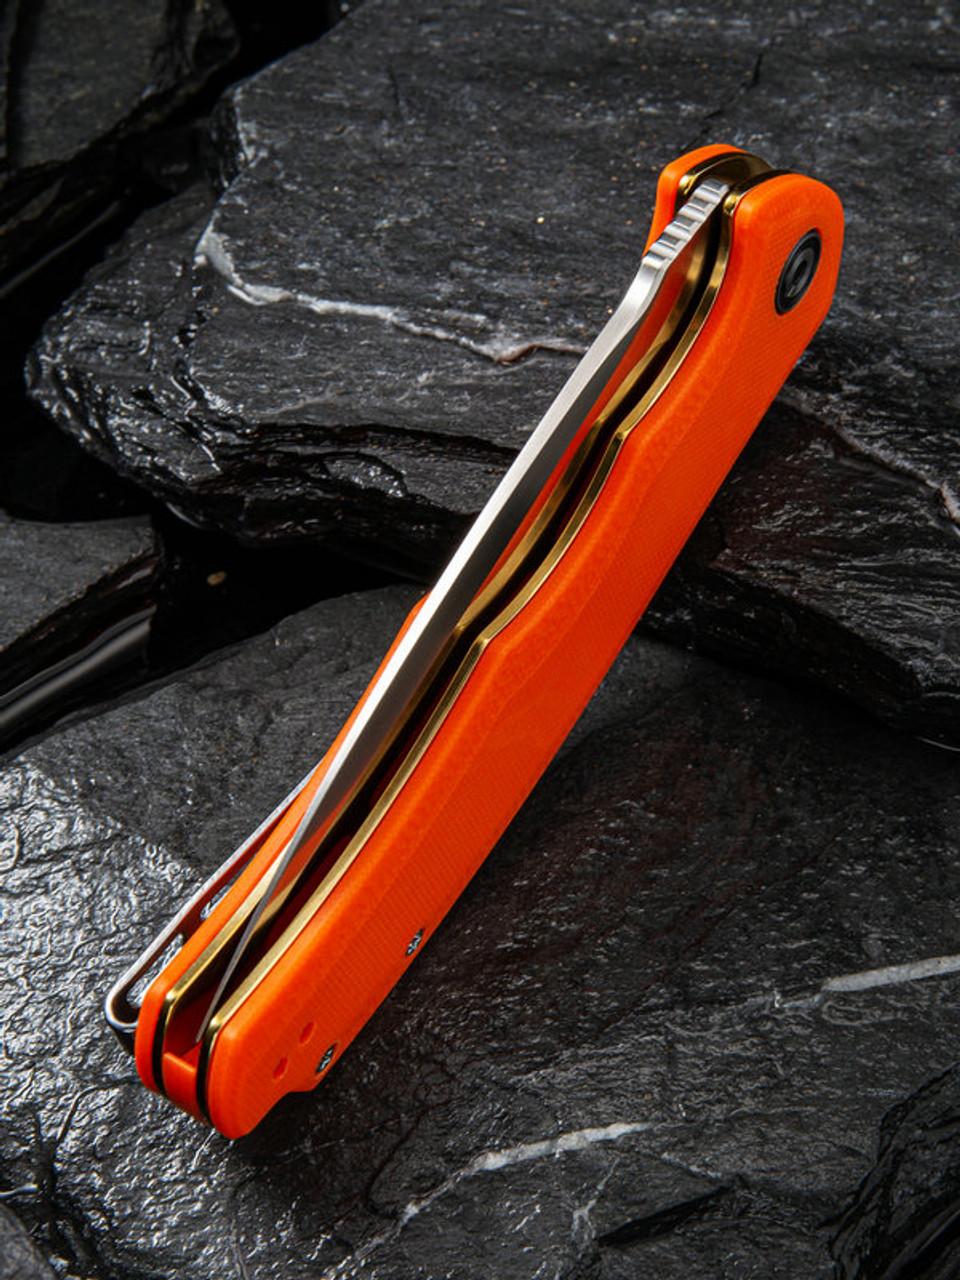 CIVC803D Civivi Praxis Orange 9Cr18MoV Blade G10 Handle Linerlock Clip